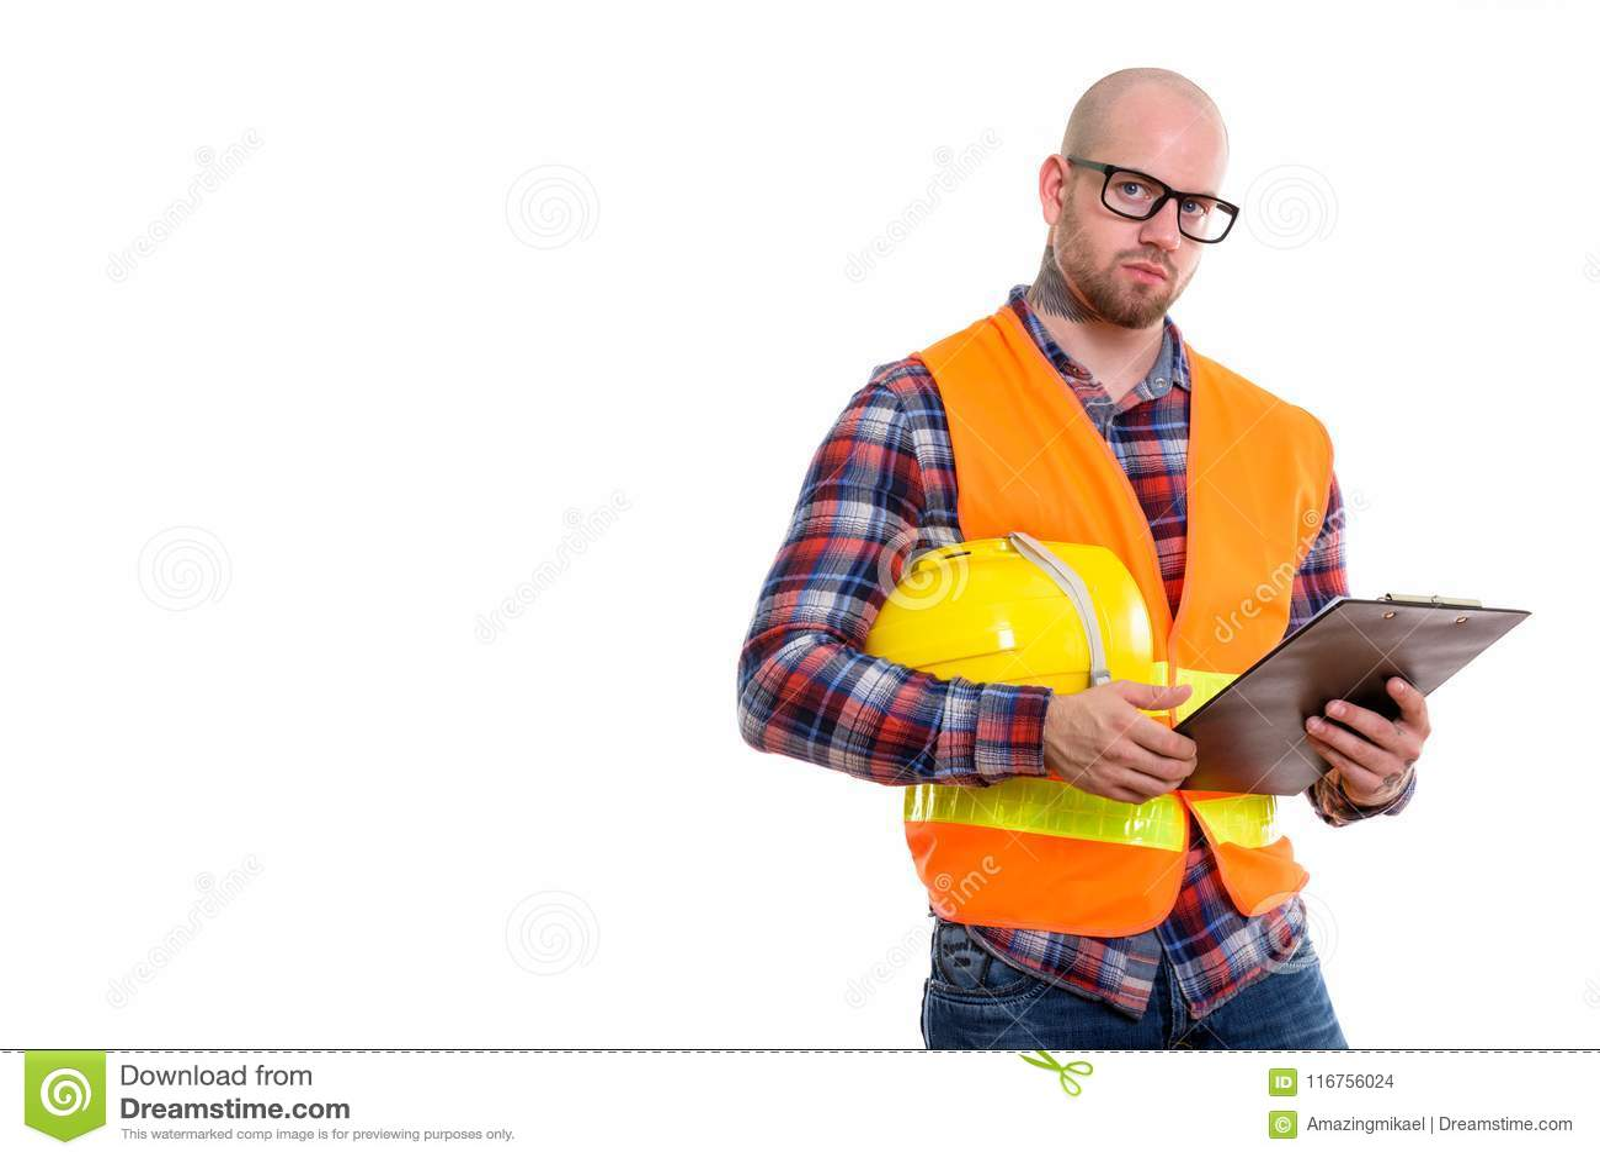 Young bald muscular man construction worker